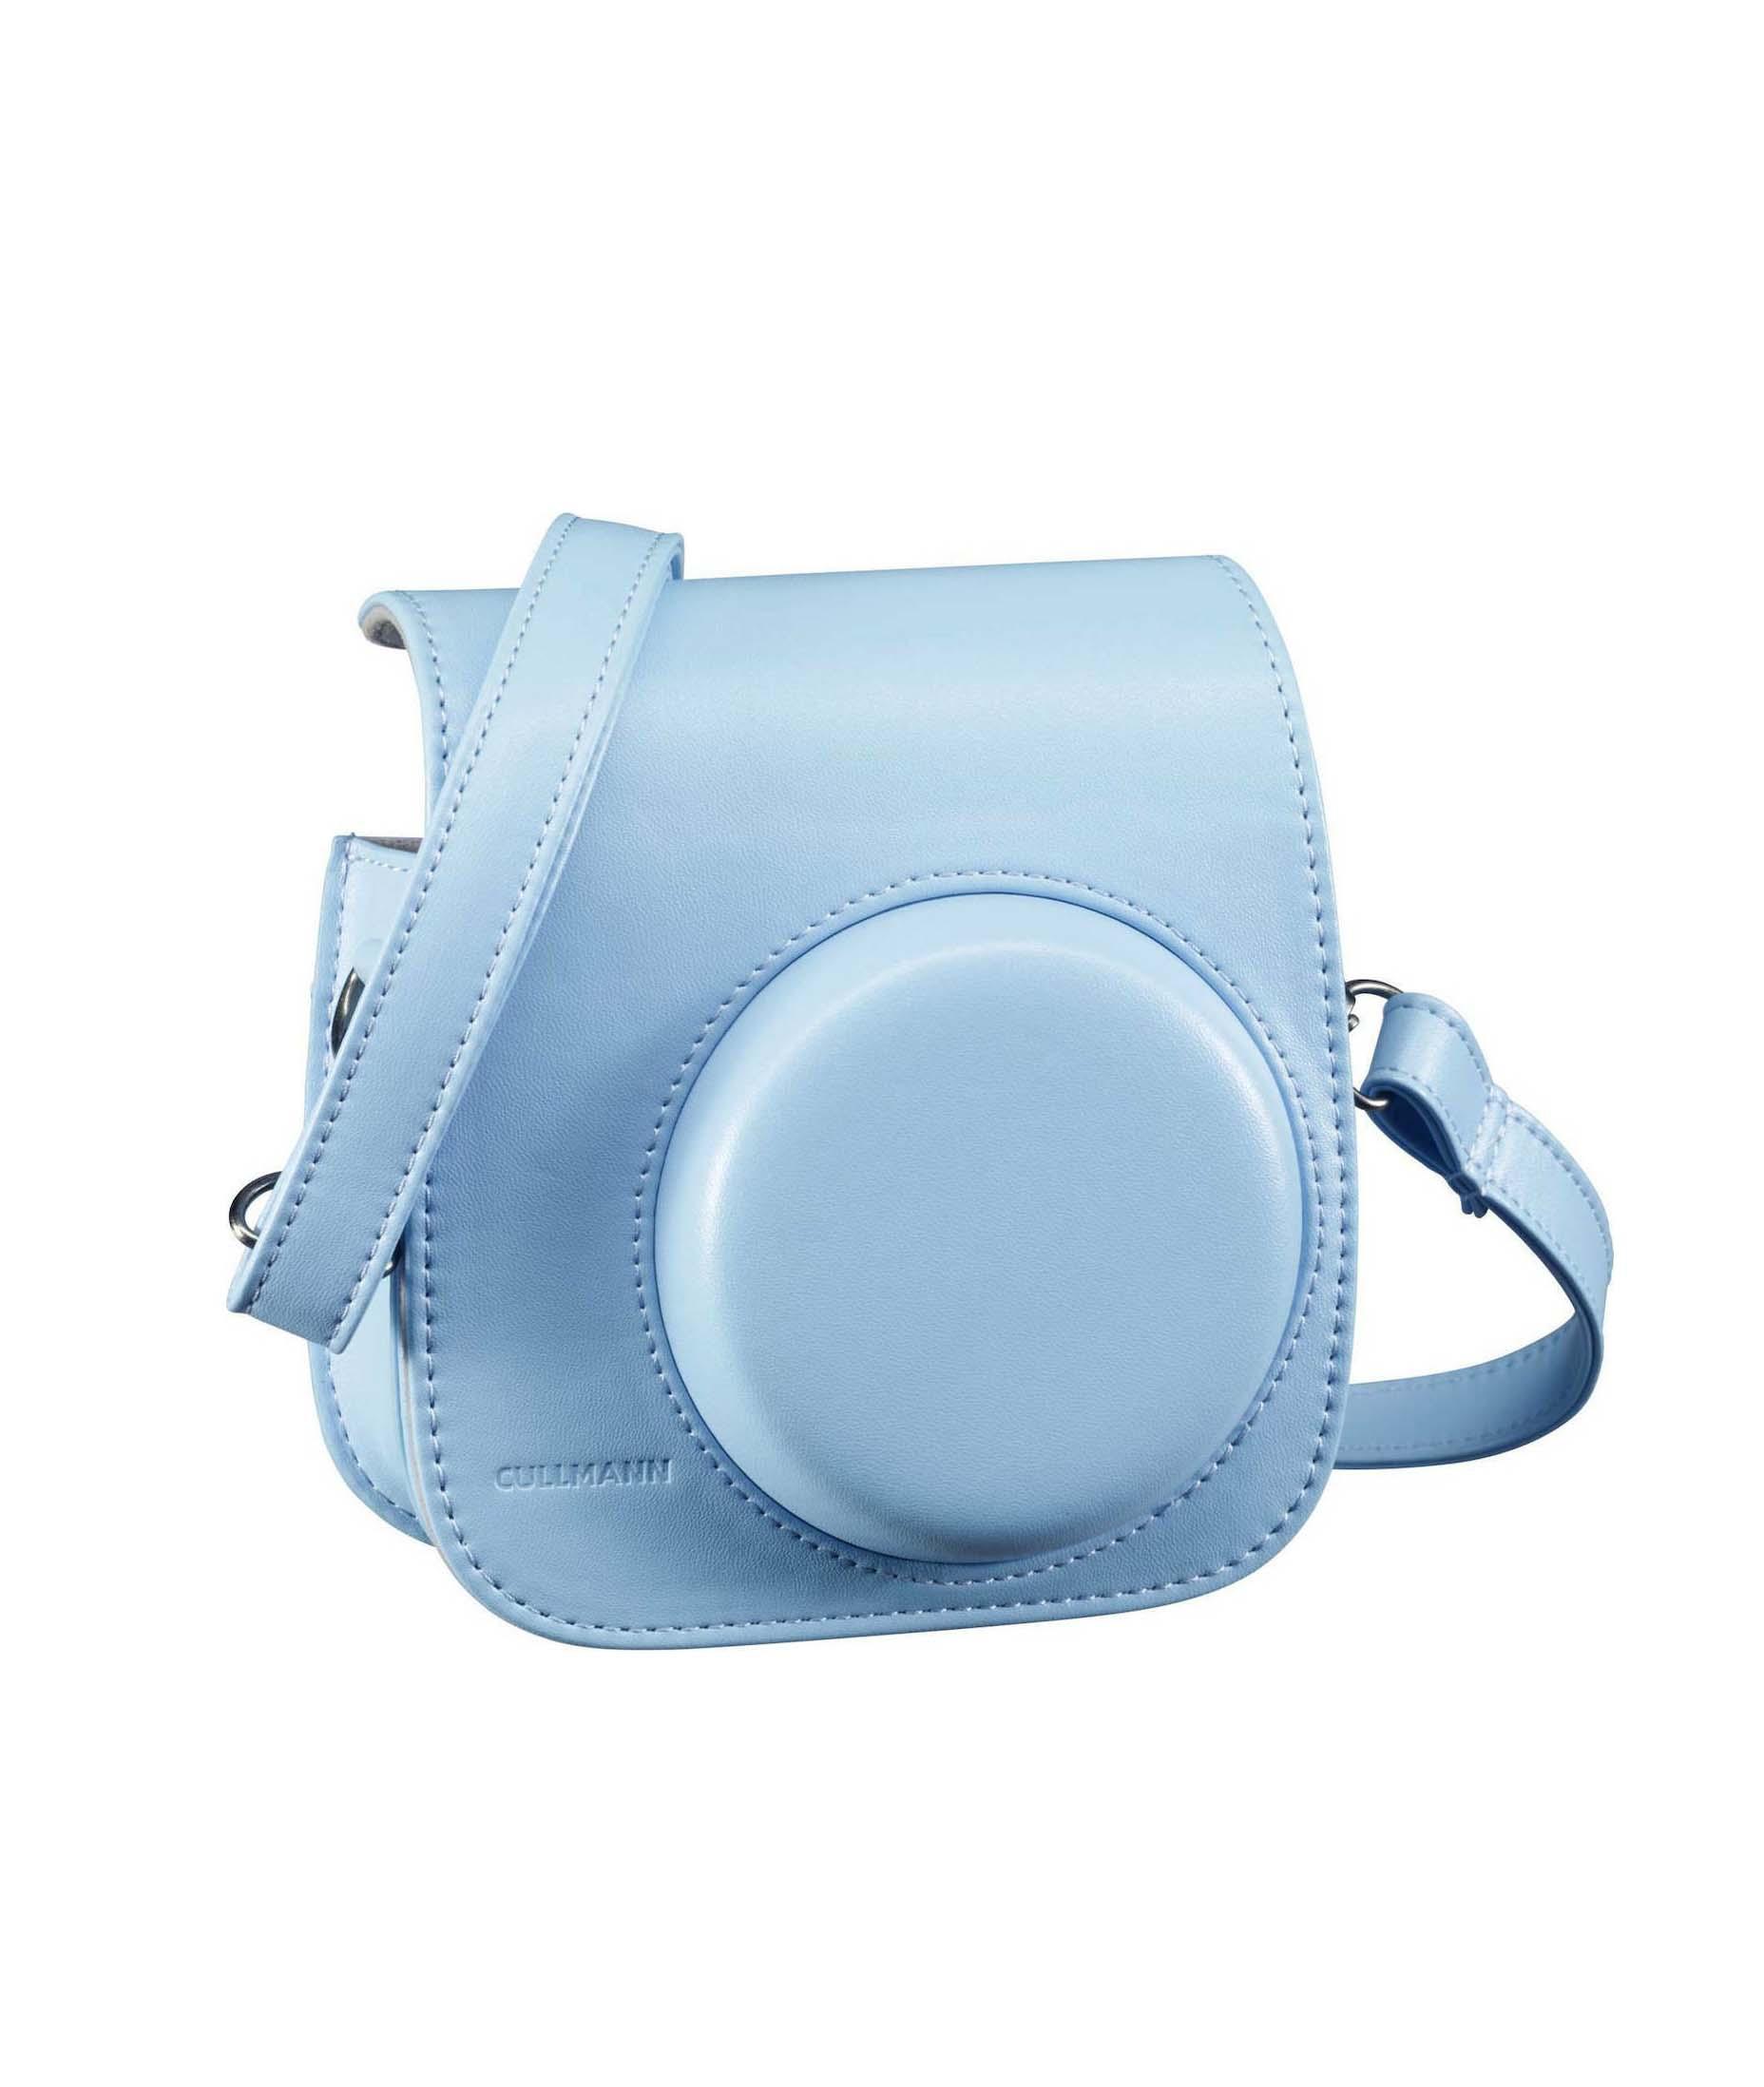 Cullmann Rio Fit 110 Camera Bag For Instax Mini 11 Light Blue 98863